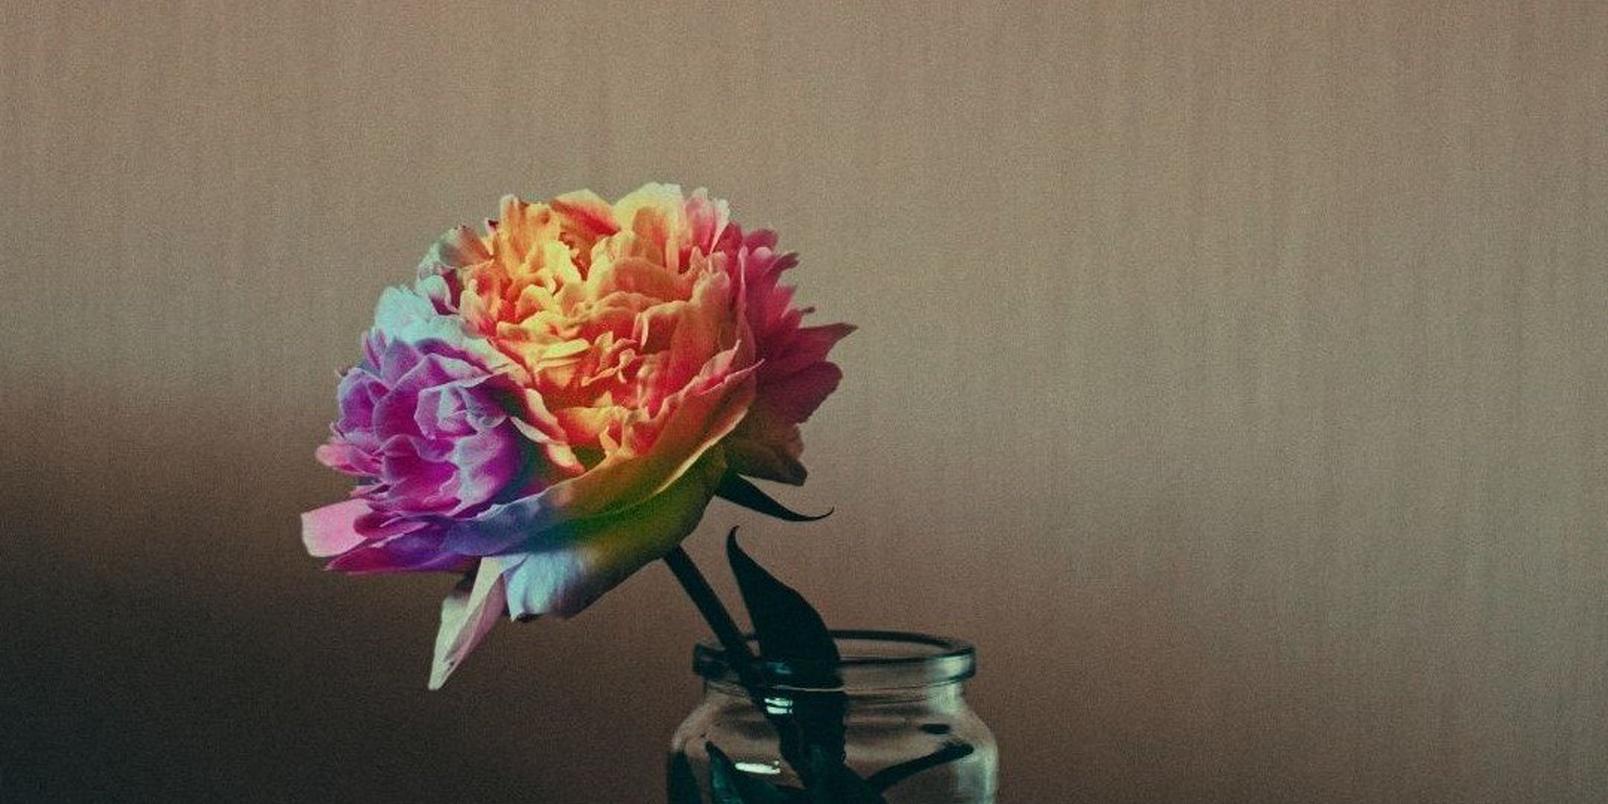 Untitled-design-42-muted-rainbow-carnation